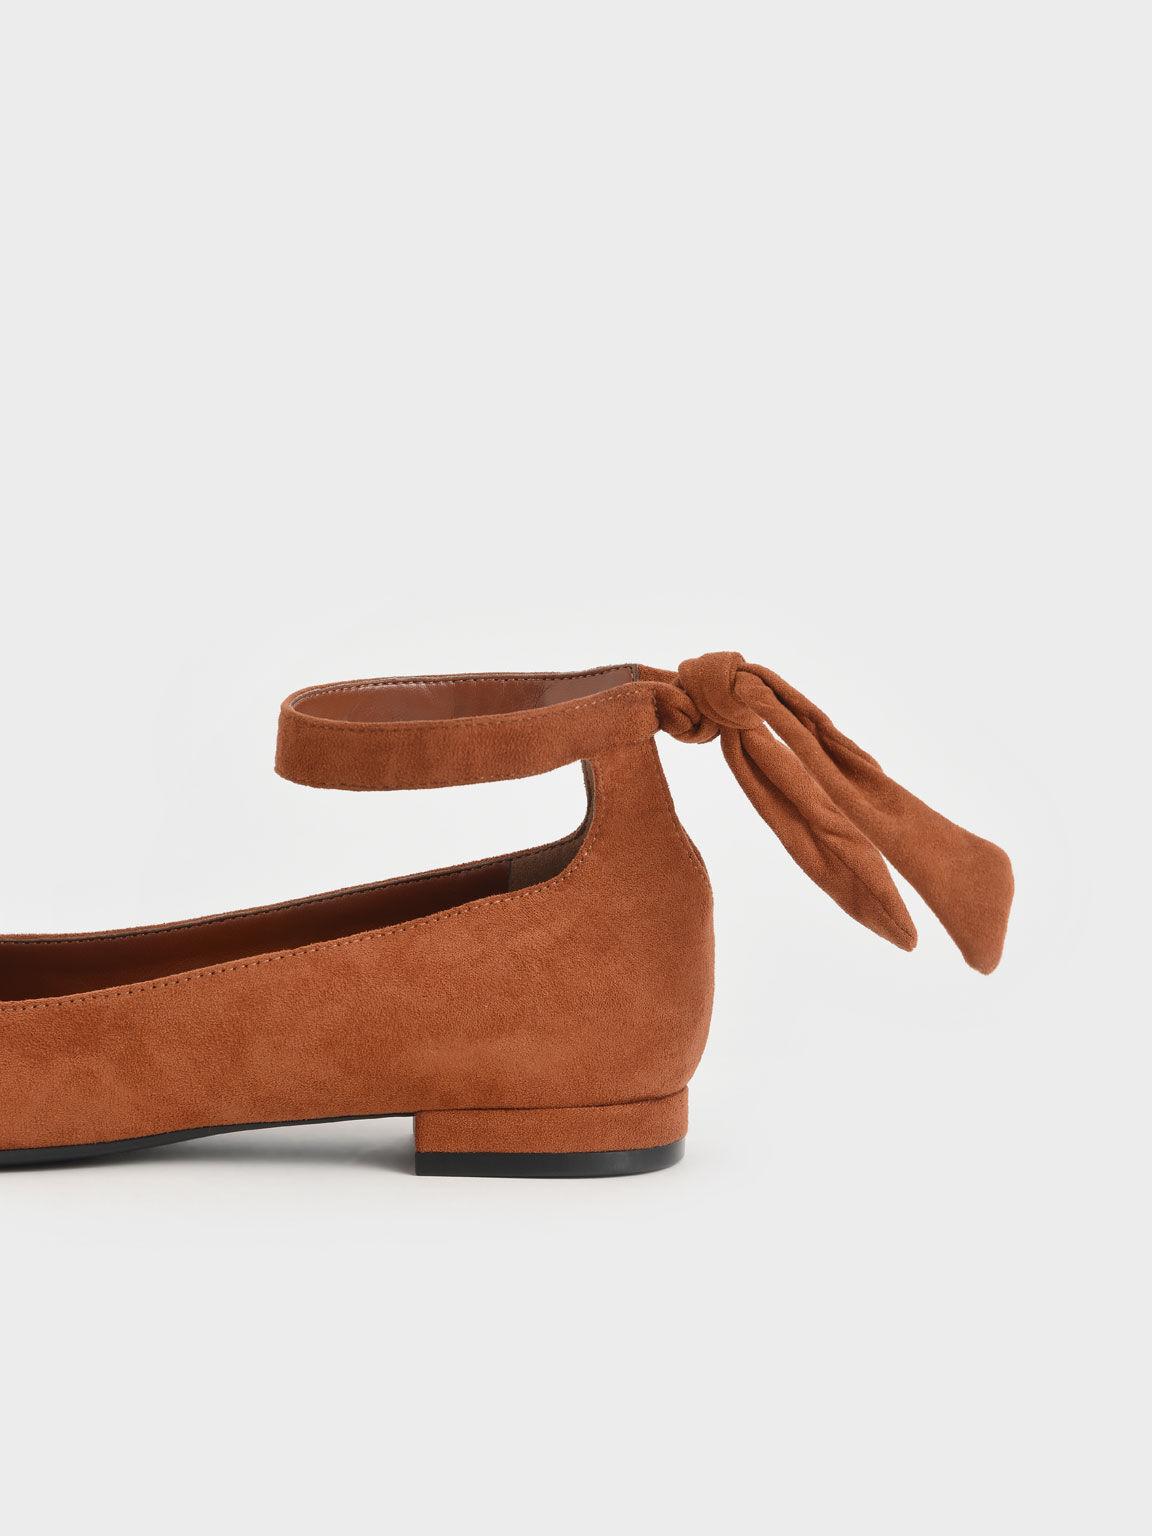 Textured Ankle Strap Ballerina Flats, Cognac, hi-res